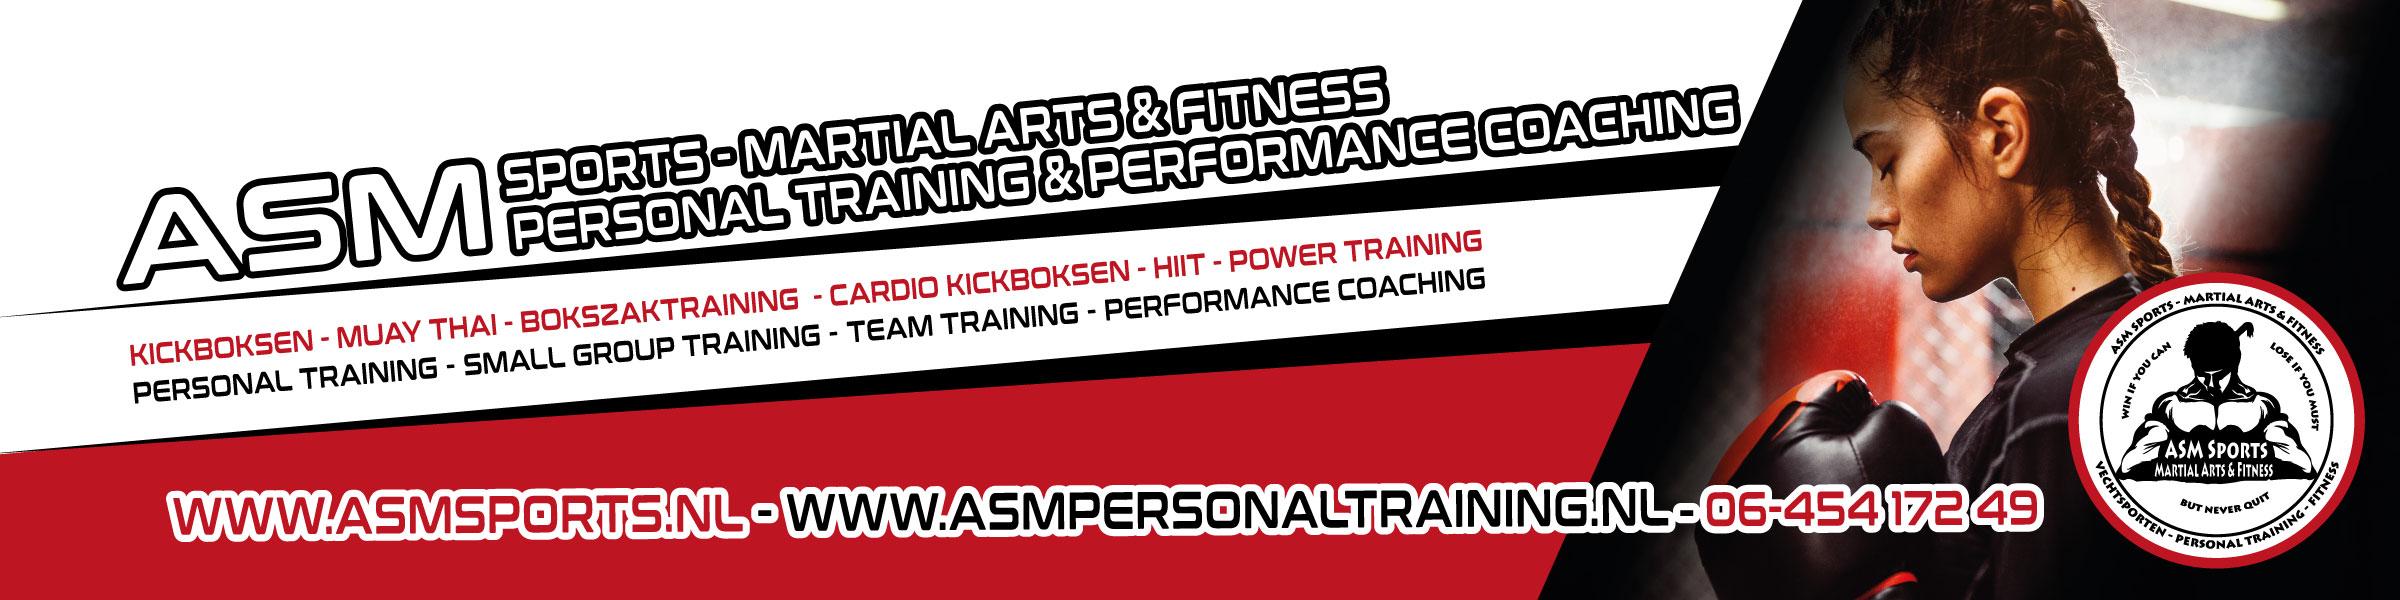 ASM Sports Martial Arts & Fitness